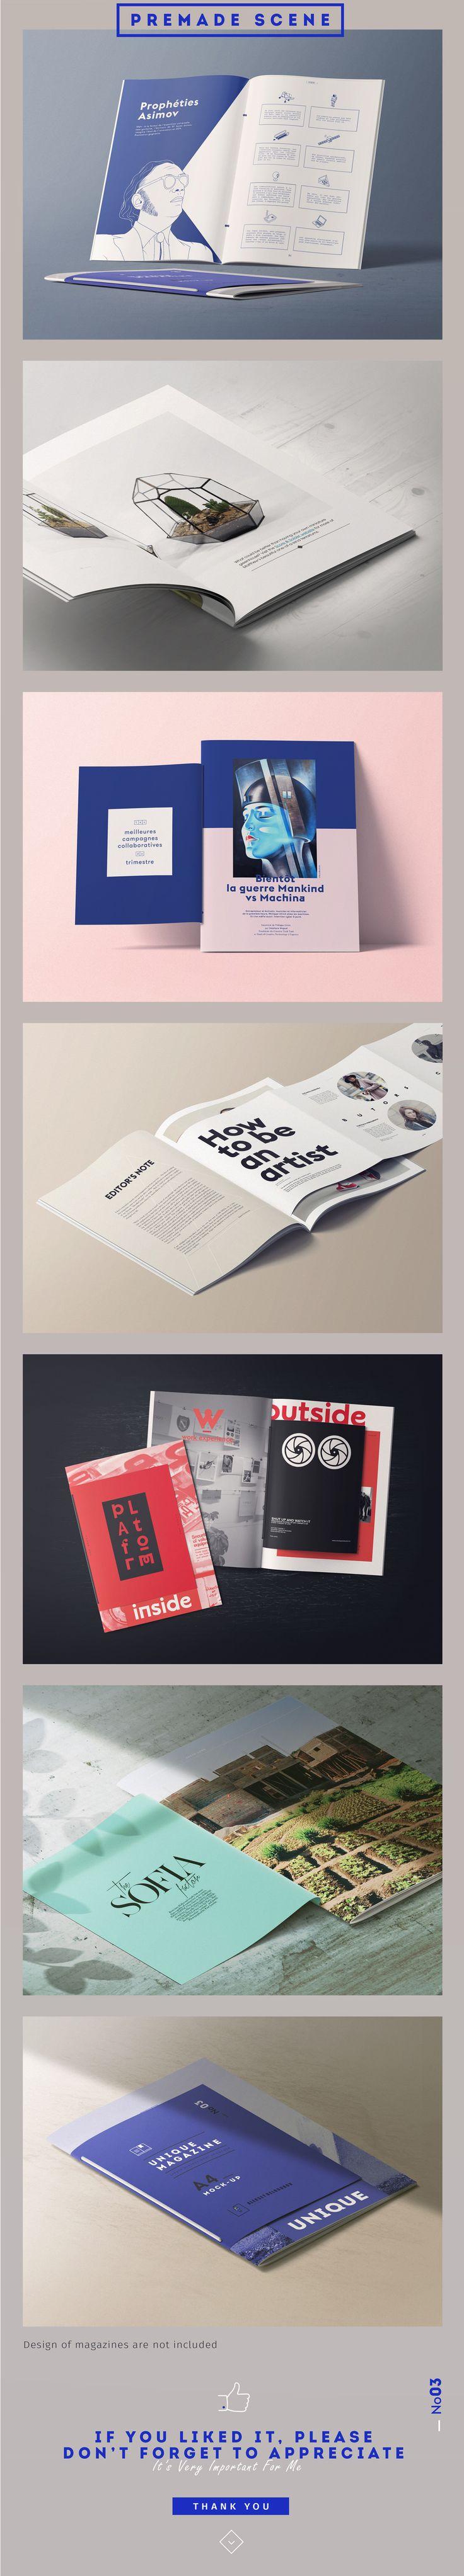 [25] UNIQUE MAGAZINES MOCKUPS/rope by Aleksey_Belorukov on @creativemarket